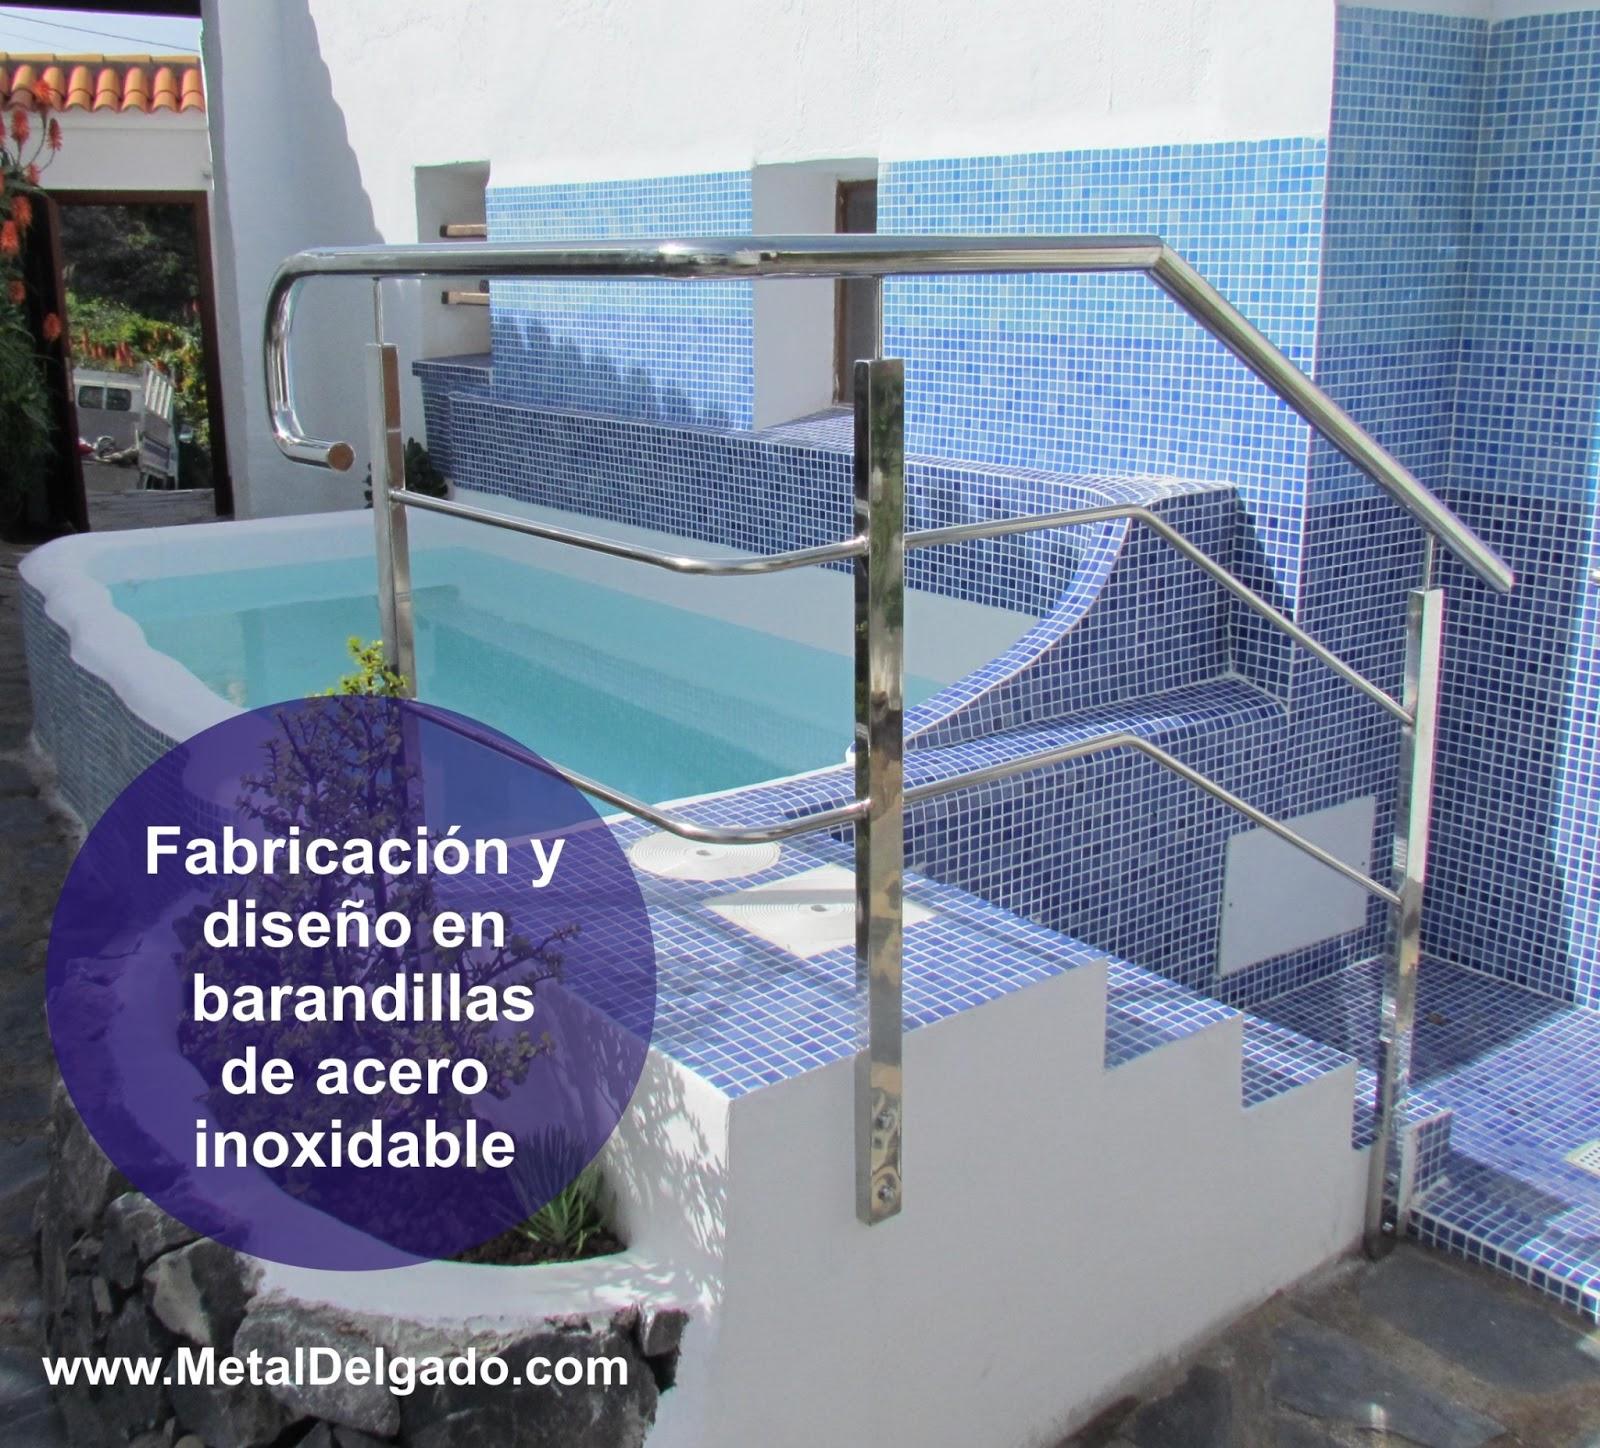 Acero inoxidable tenerife fabricaci n de barandas de for Fabricacion de piscinas